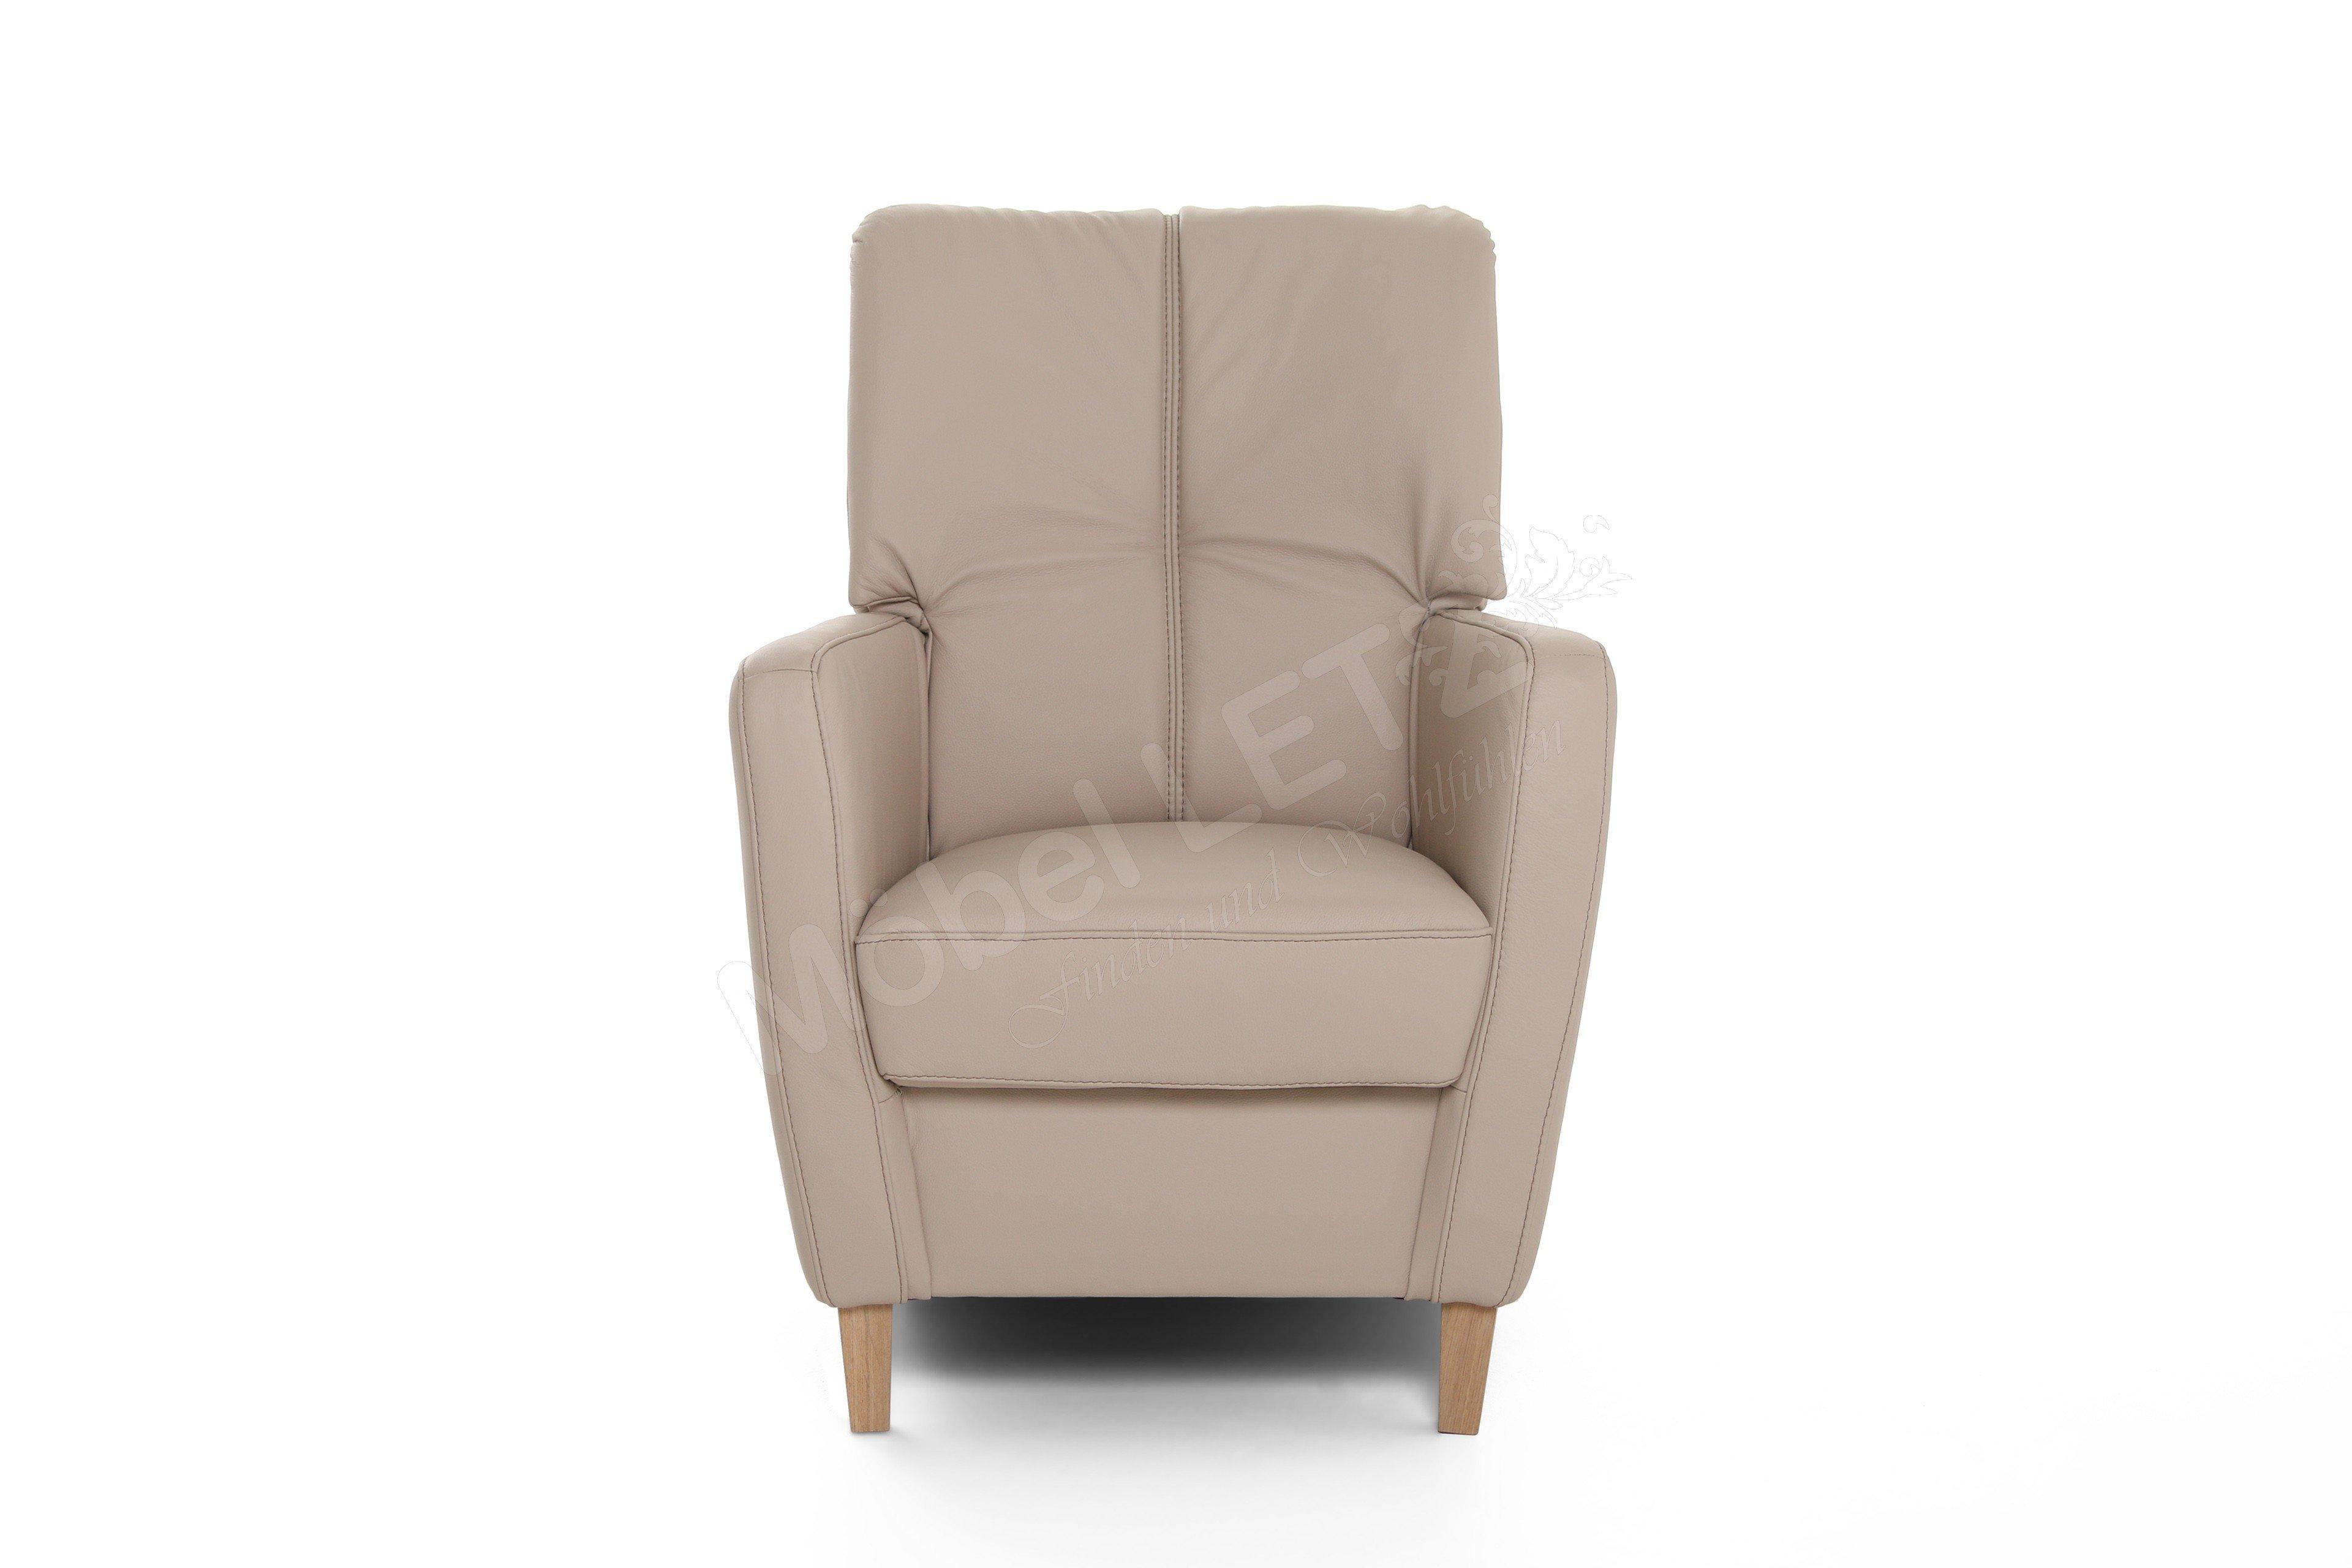 pm oelsa viola einzelsessel in beige m bel letz ihr online shop. Black Bedroom Furniture Sets. Home Design Ideas